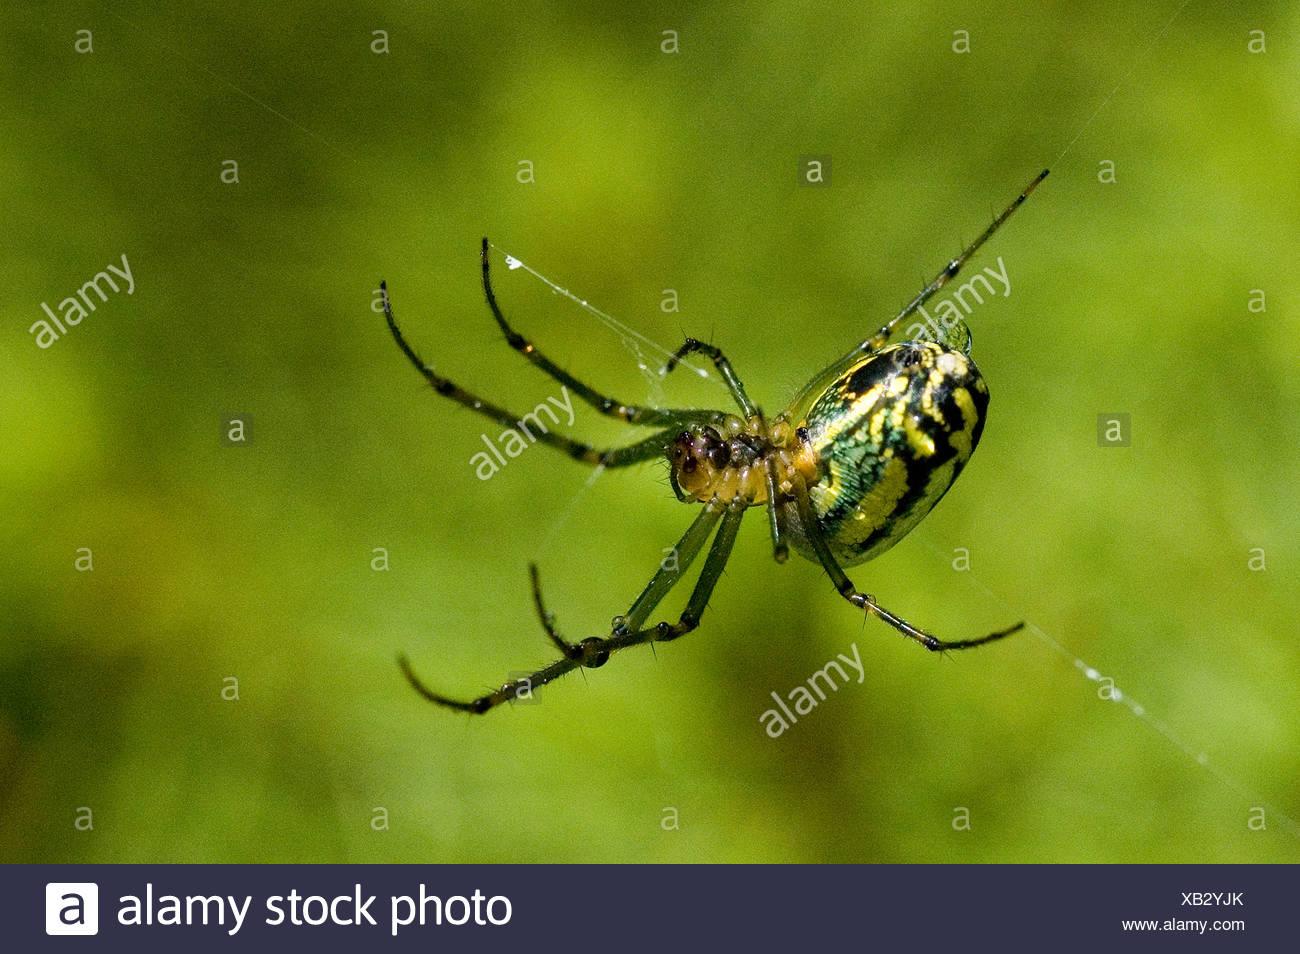 Close view of Cobweb Weaver spider. - Stock Image